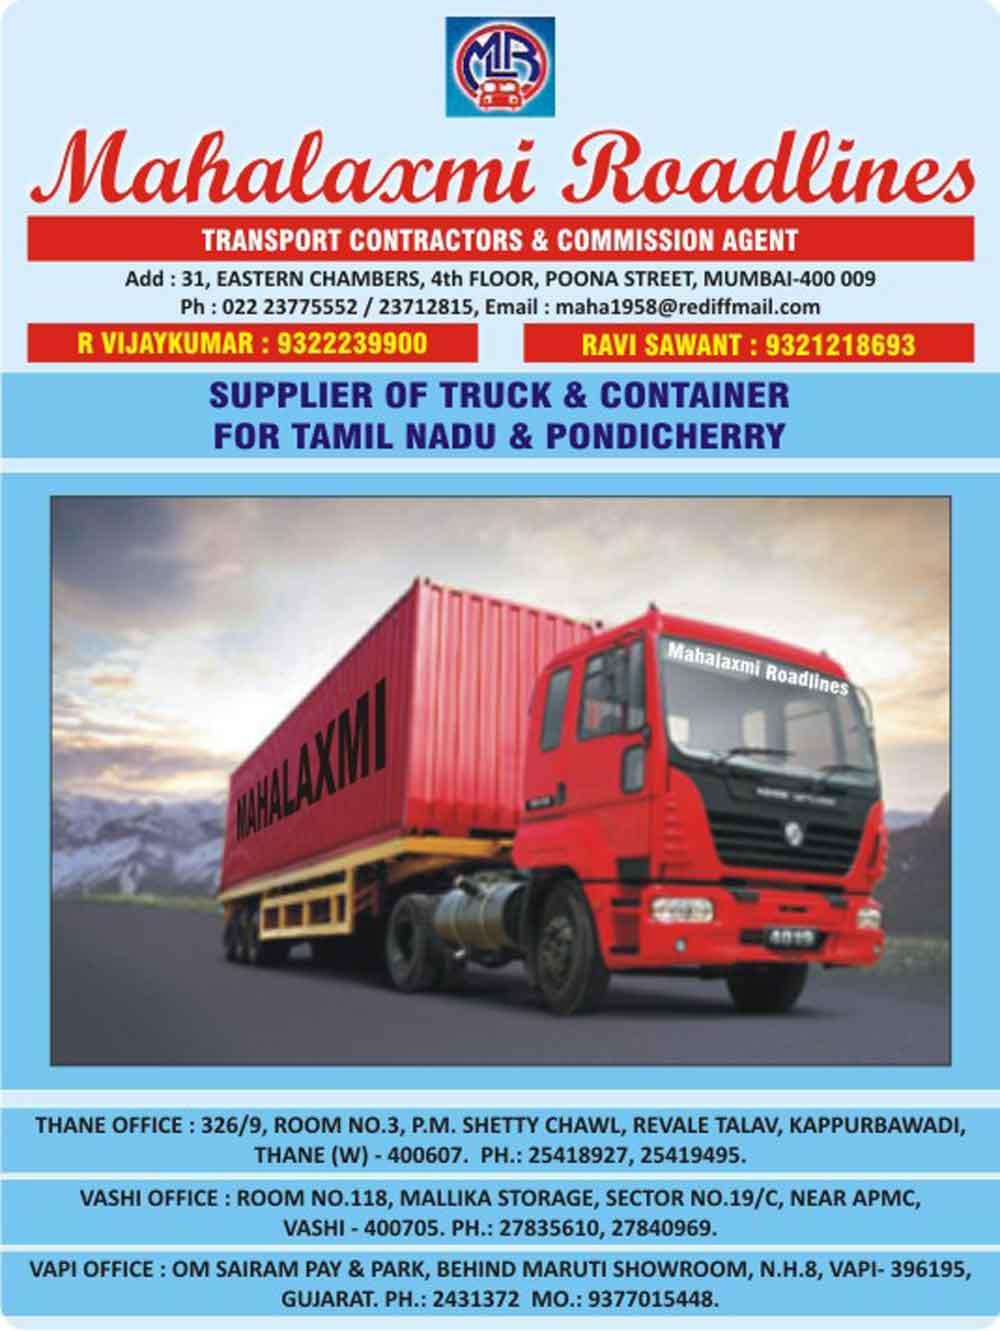 Mahalaxmi Roadlines